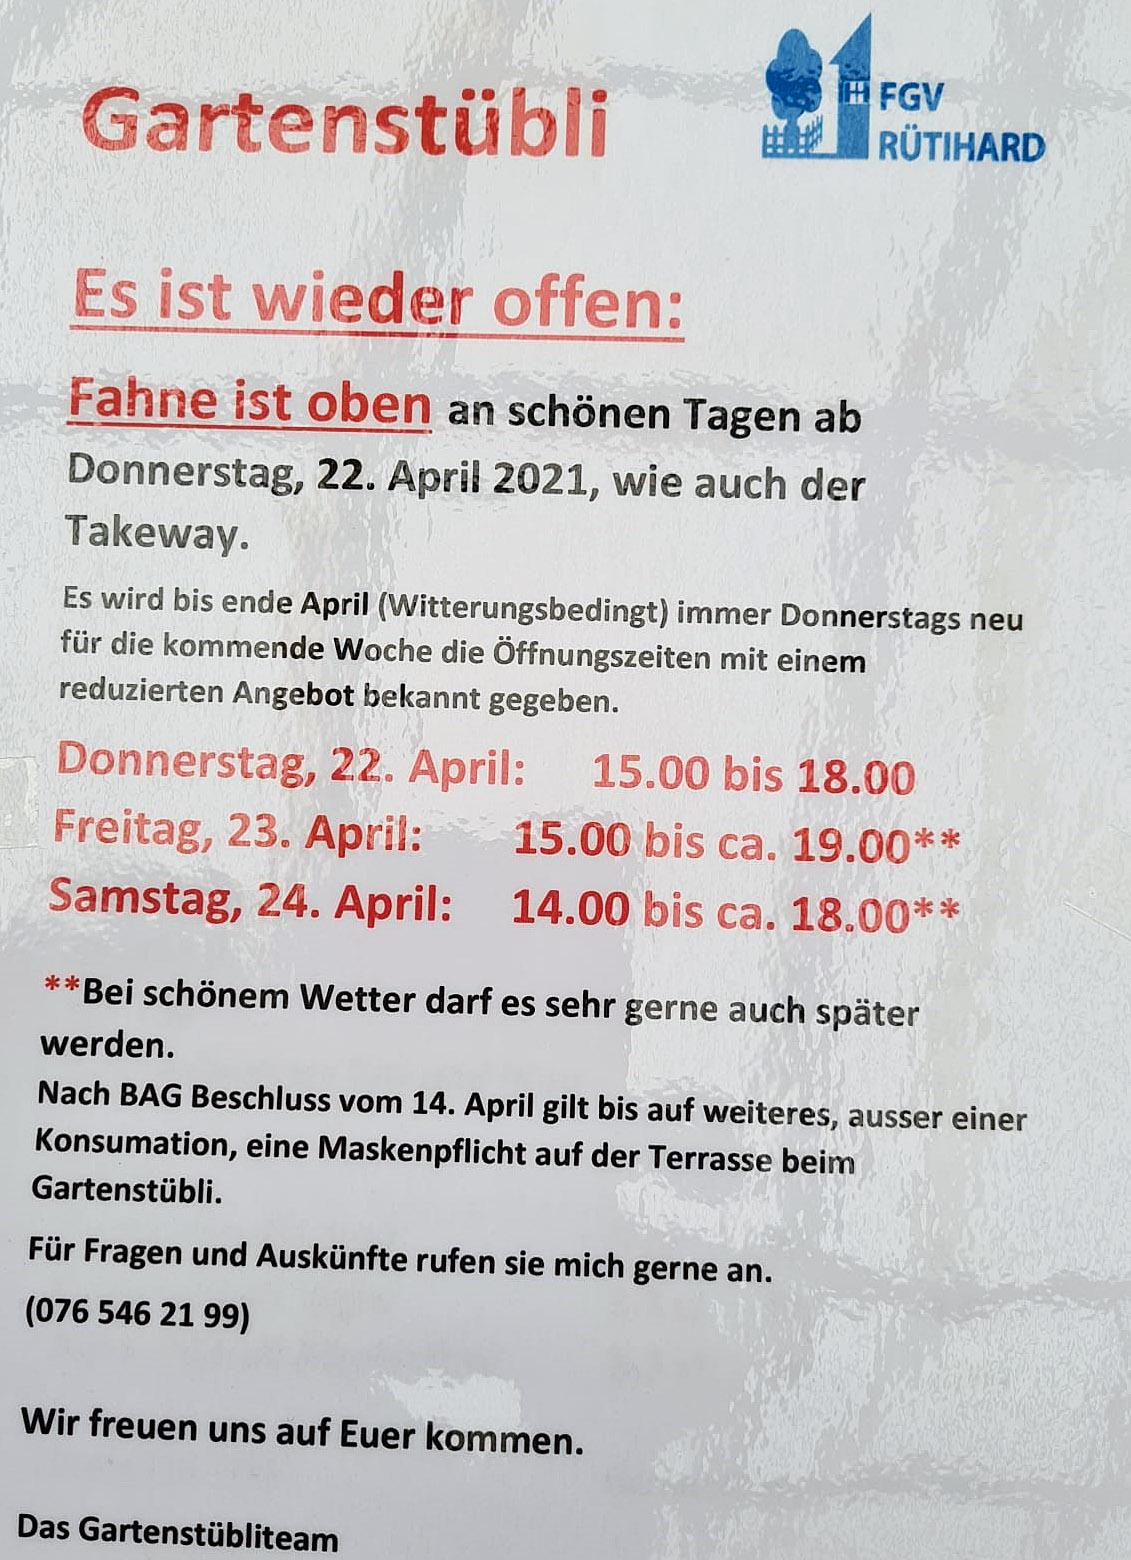 FGV Rütihard / Gartenstübli